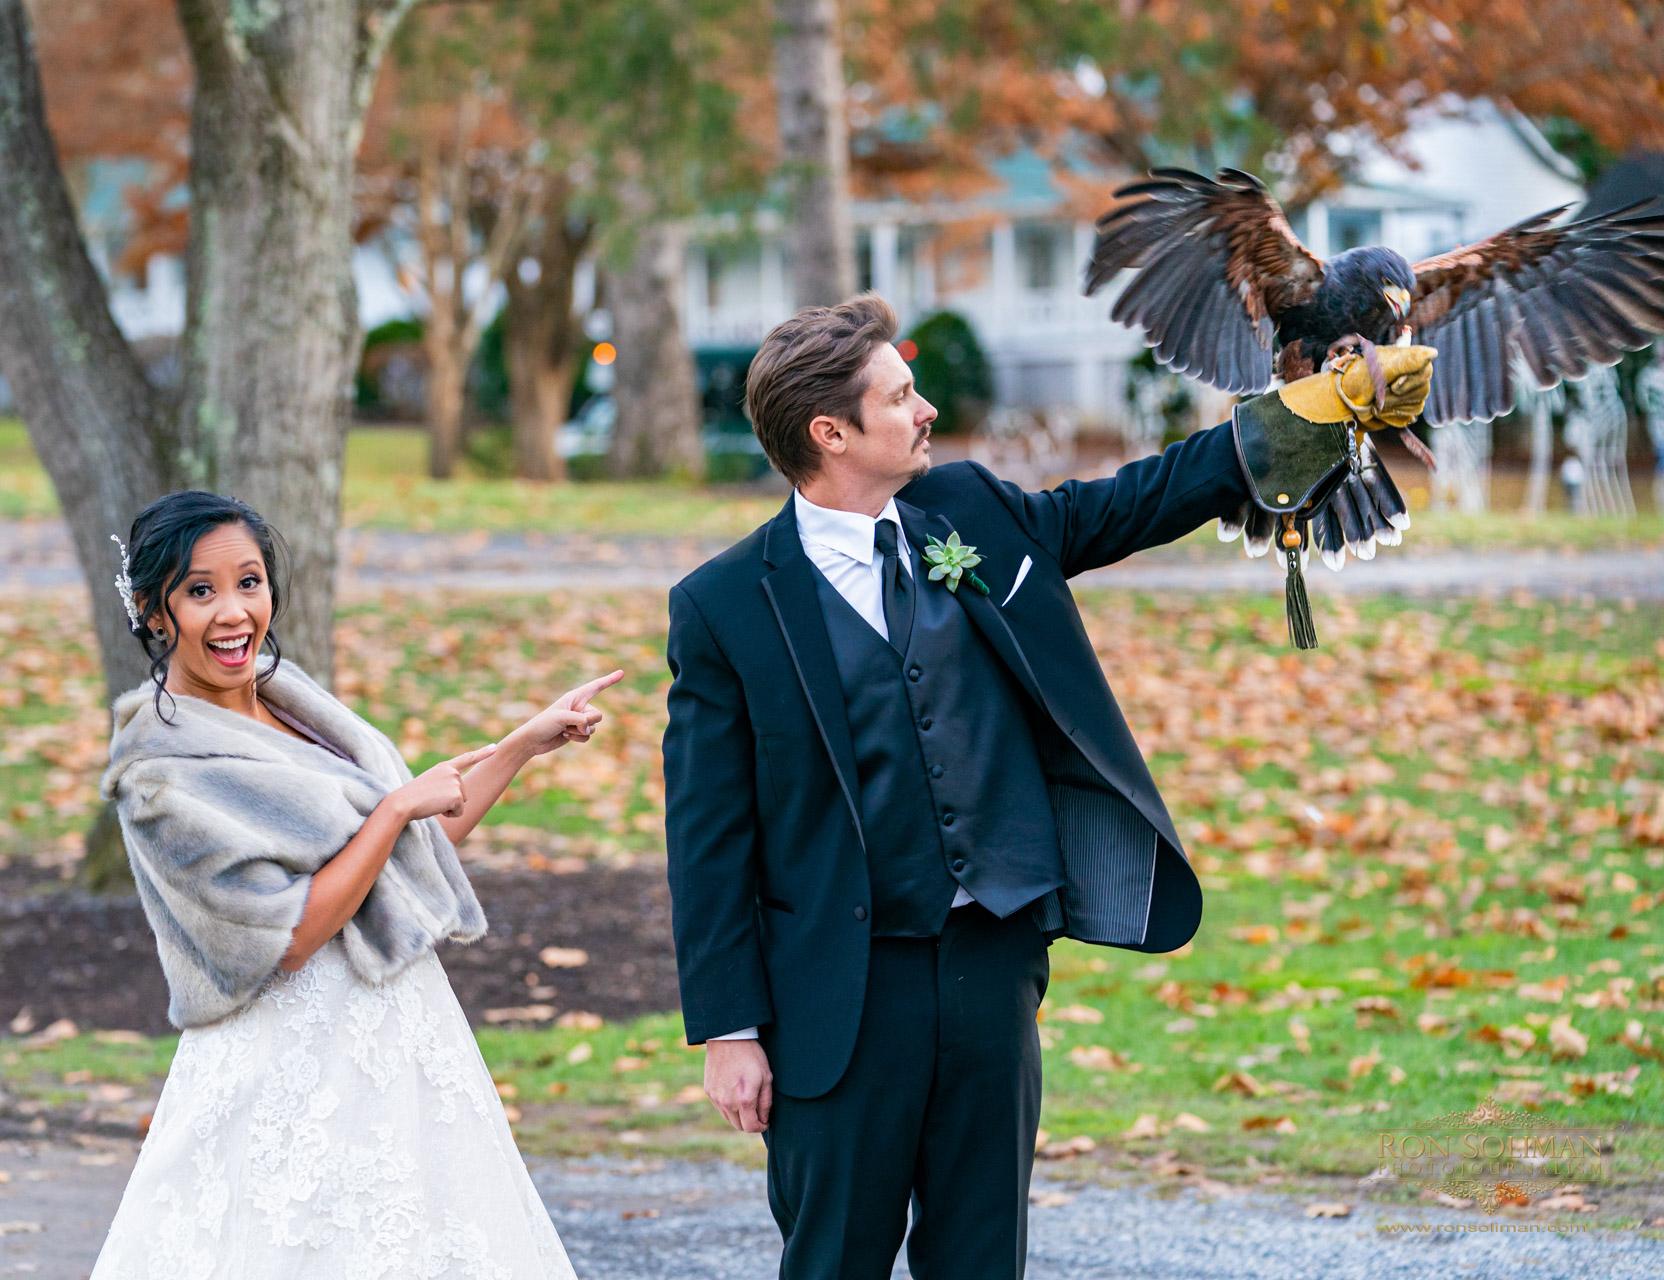 THE GREENBRIER RESORT WEDDING 37